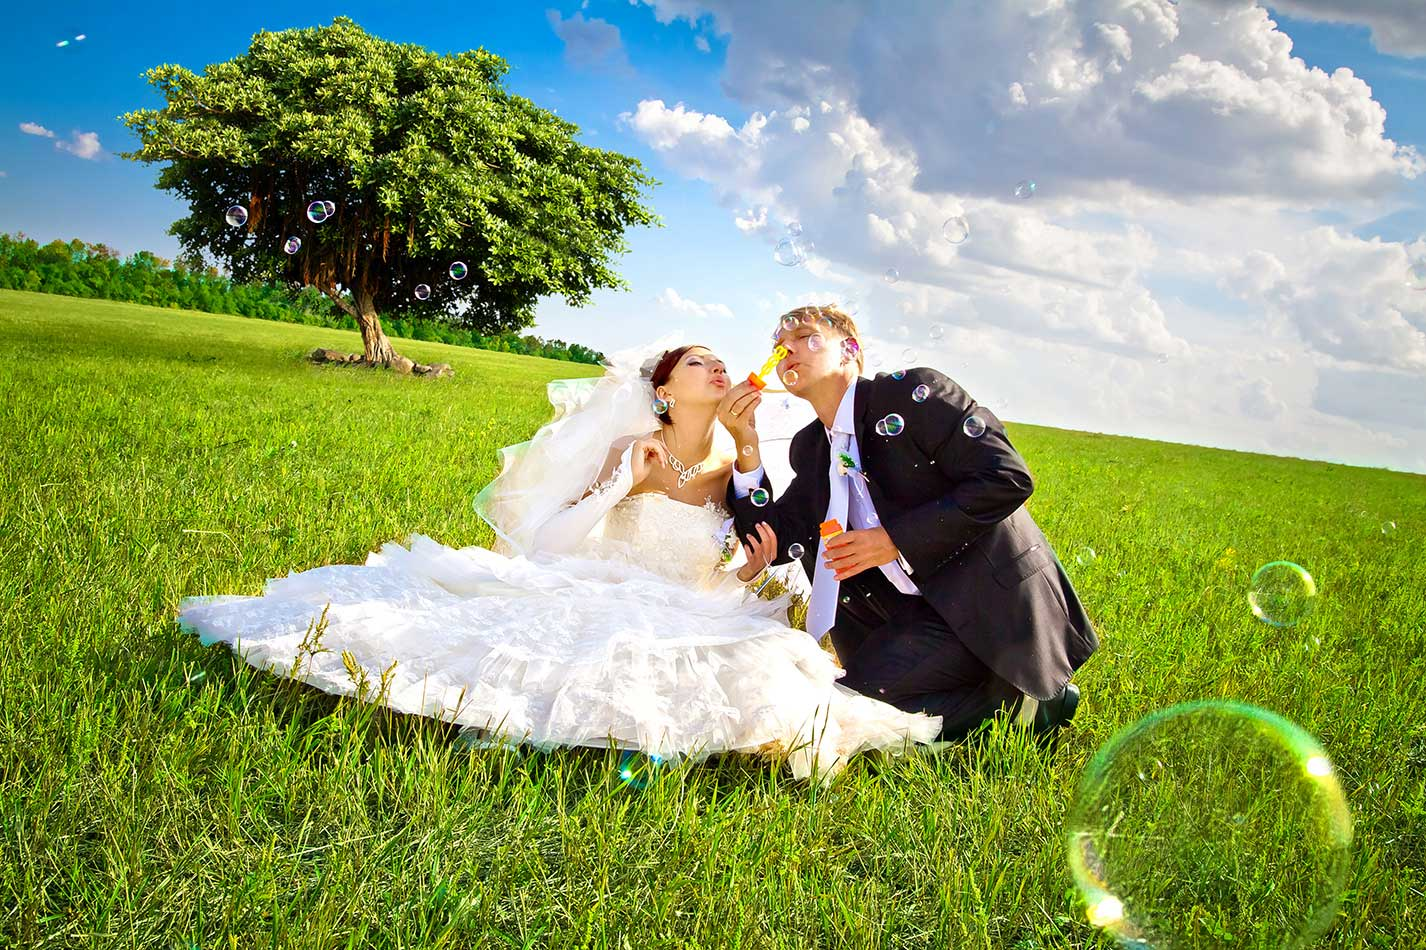 Идеи для свадебного фото на природе